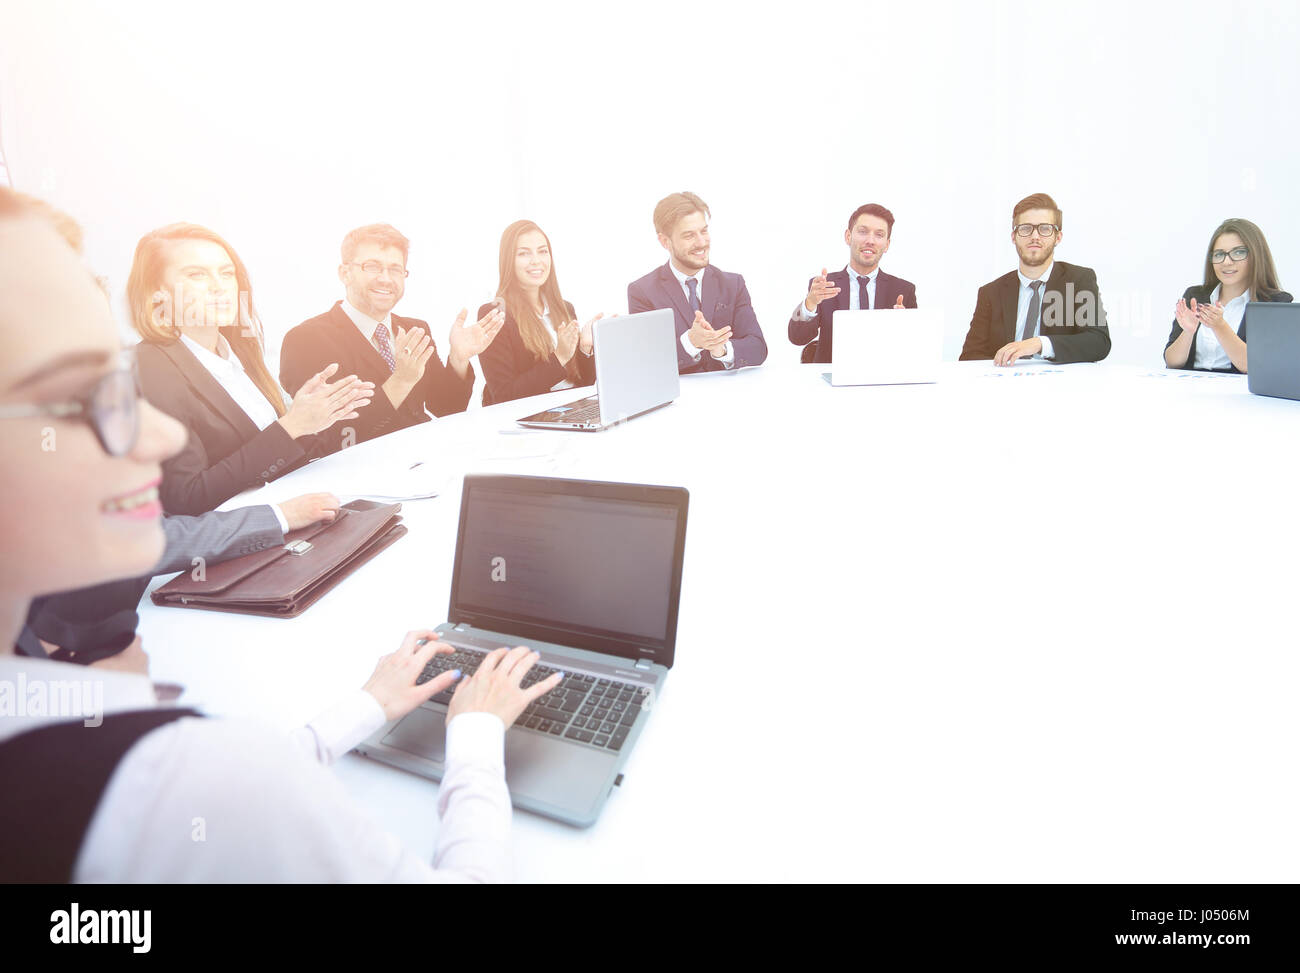 Negotiators Imágenes De Stock & Negotiators Fotos De Stock - Alamy